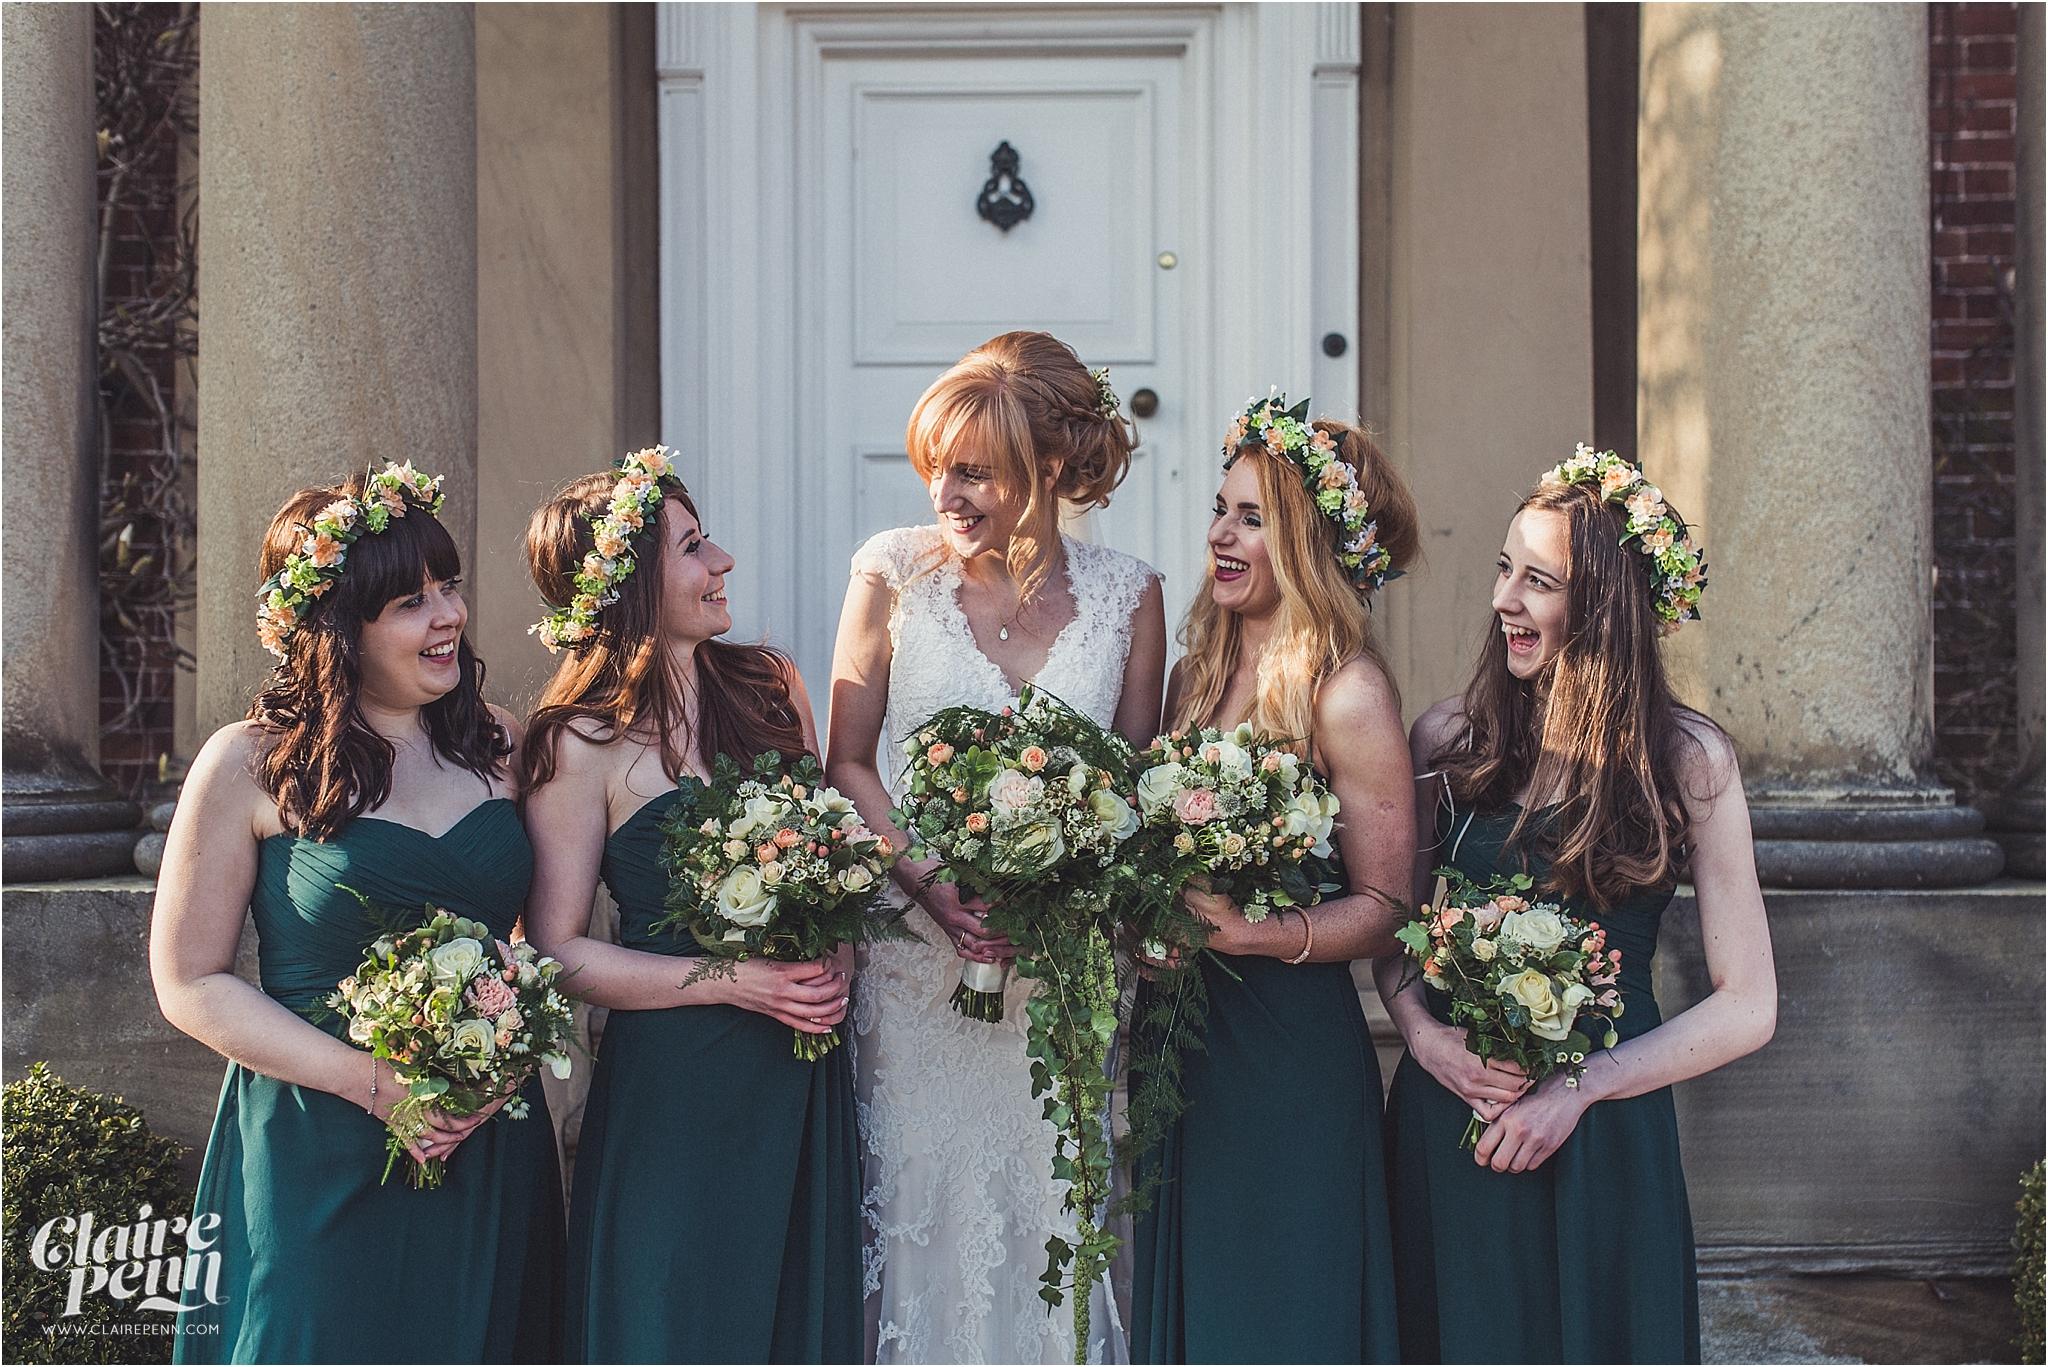 Iscoyd Park wedding, Whitchurch, Cheshire wedding photographer_0044.jpg